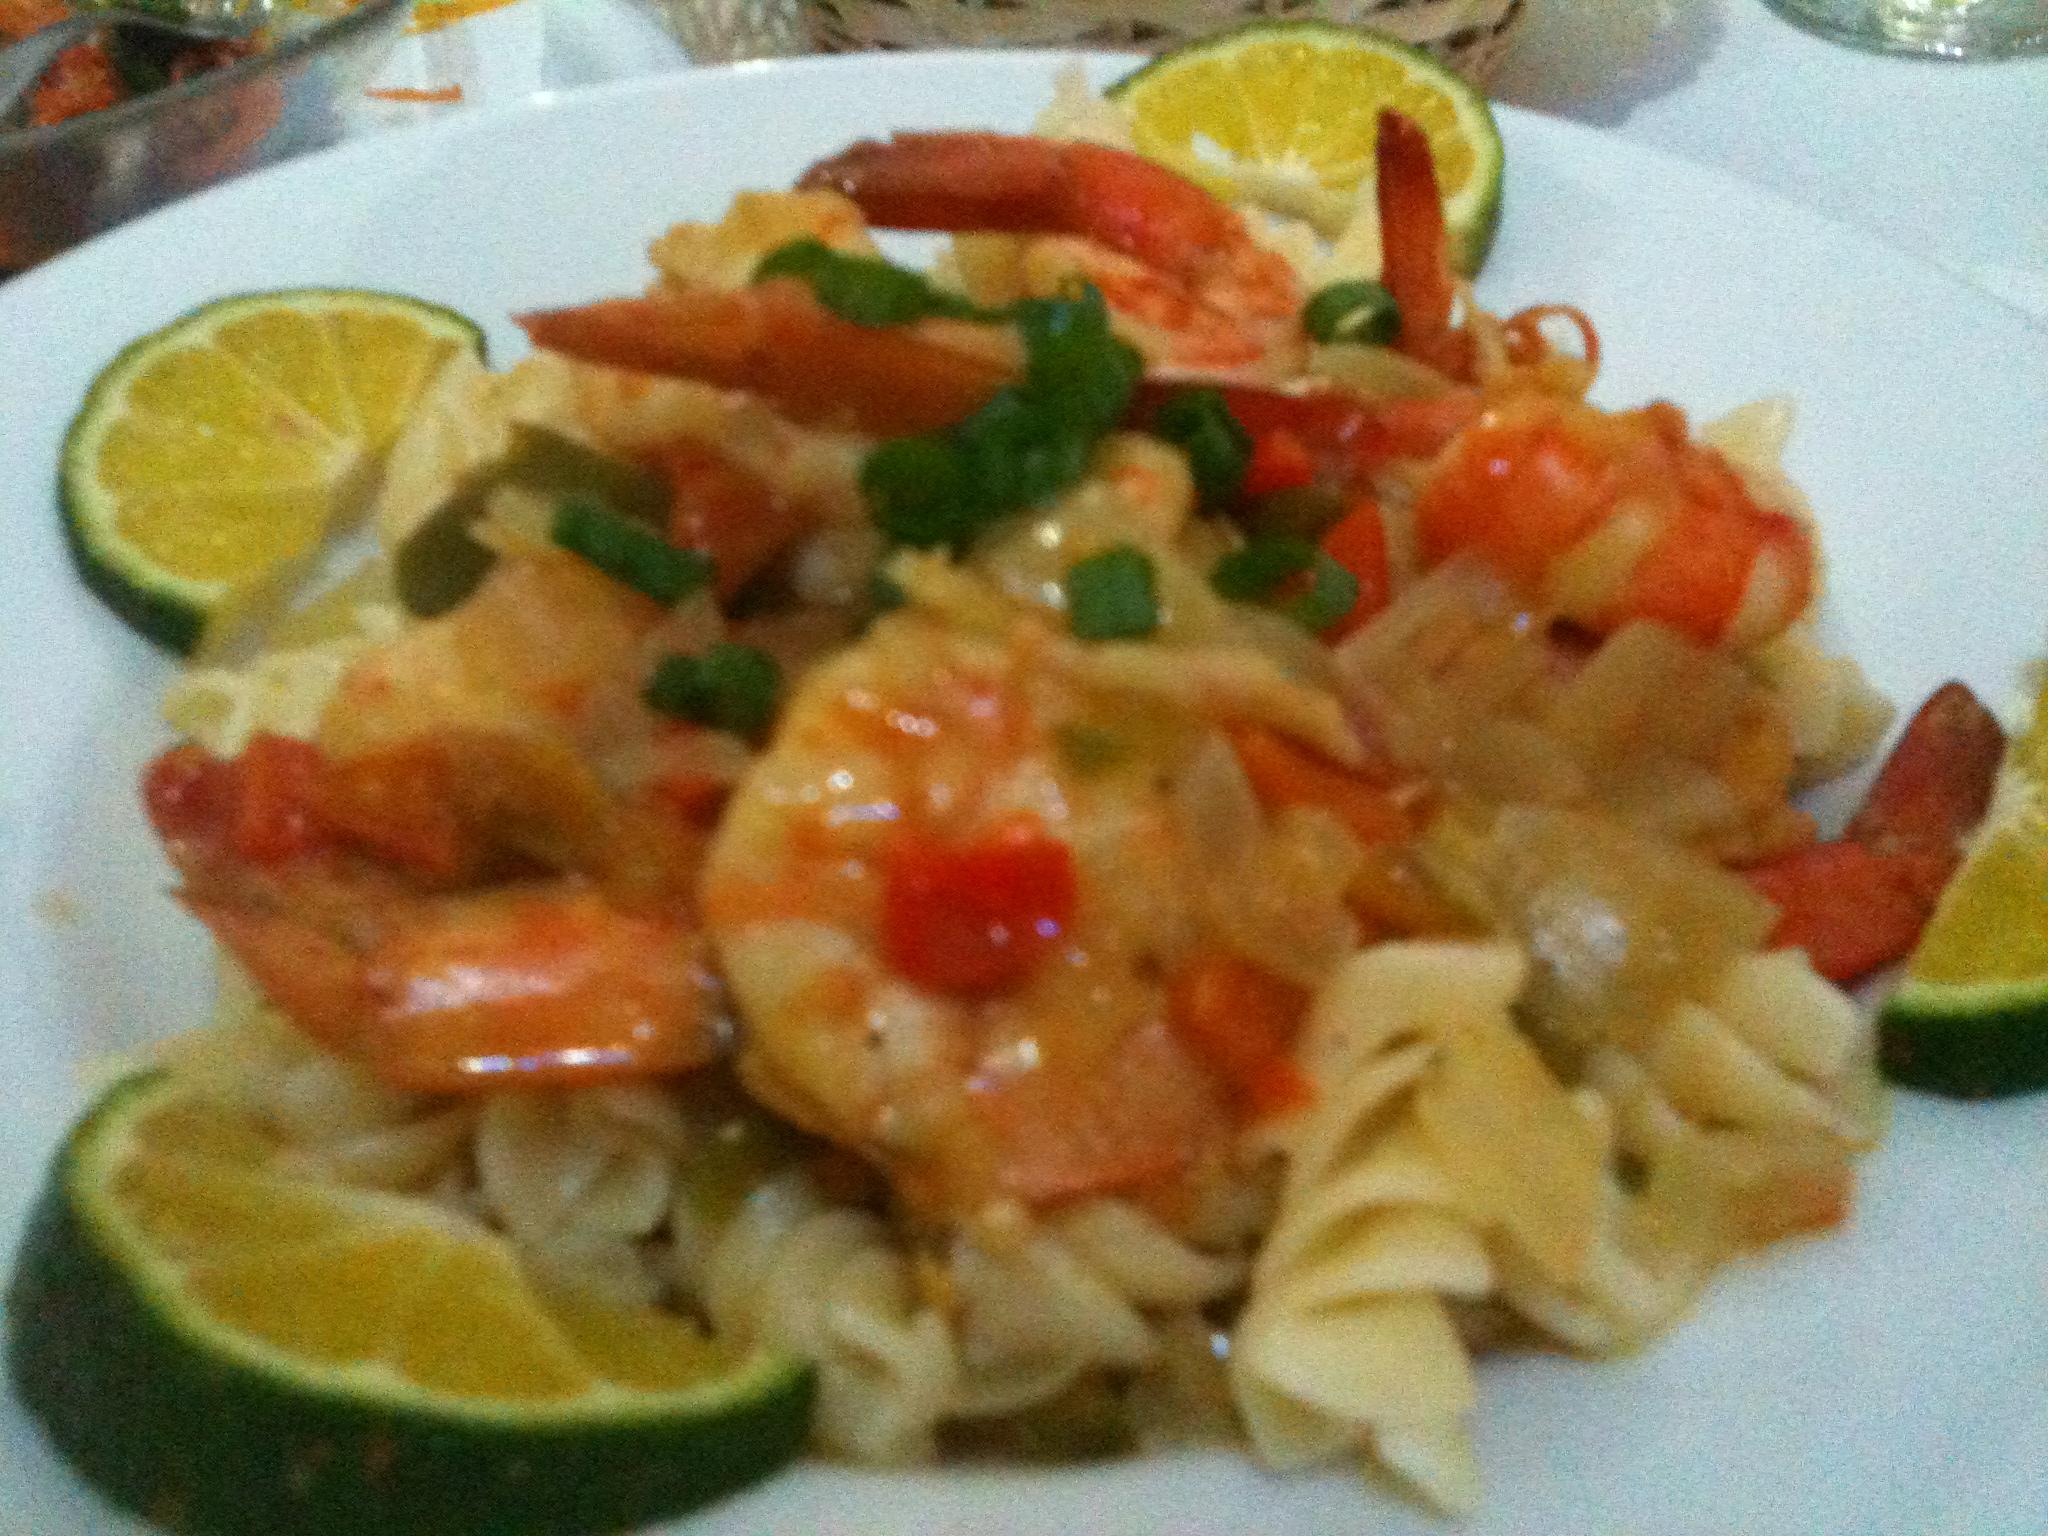 Shrimp Salad with Sour Orange